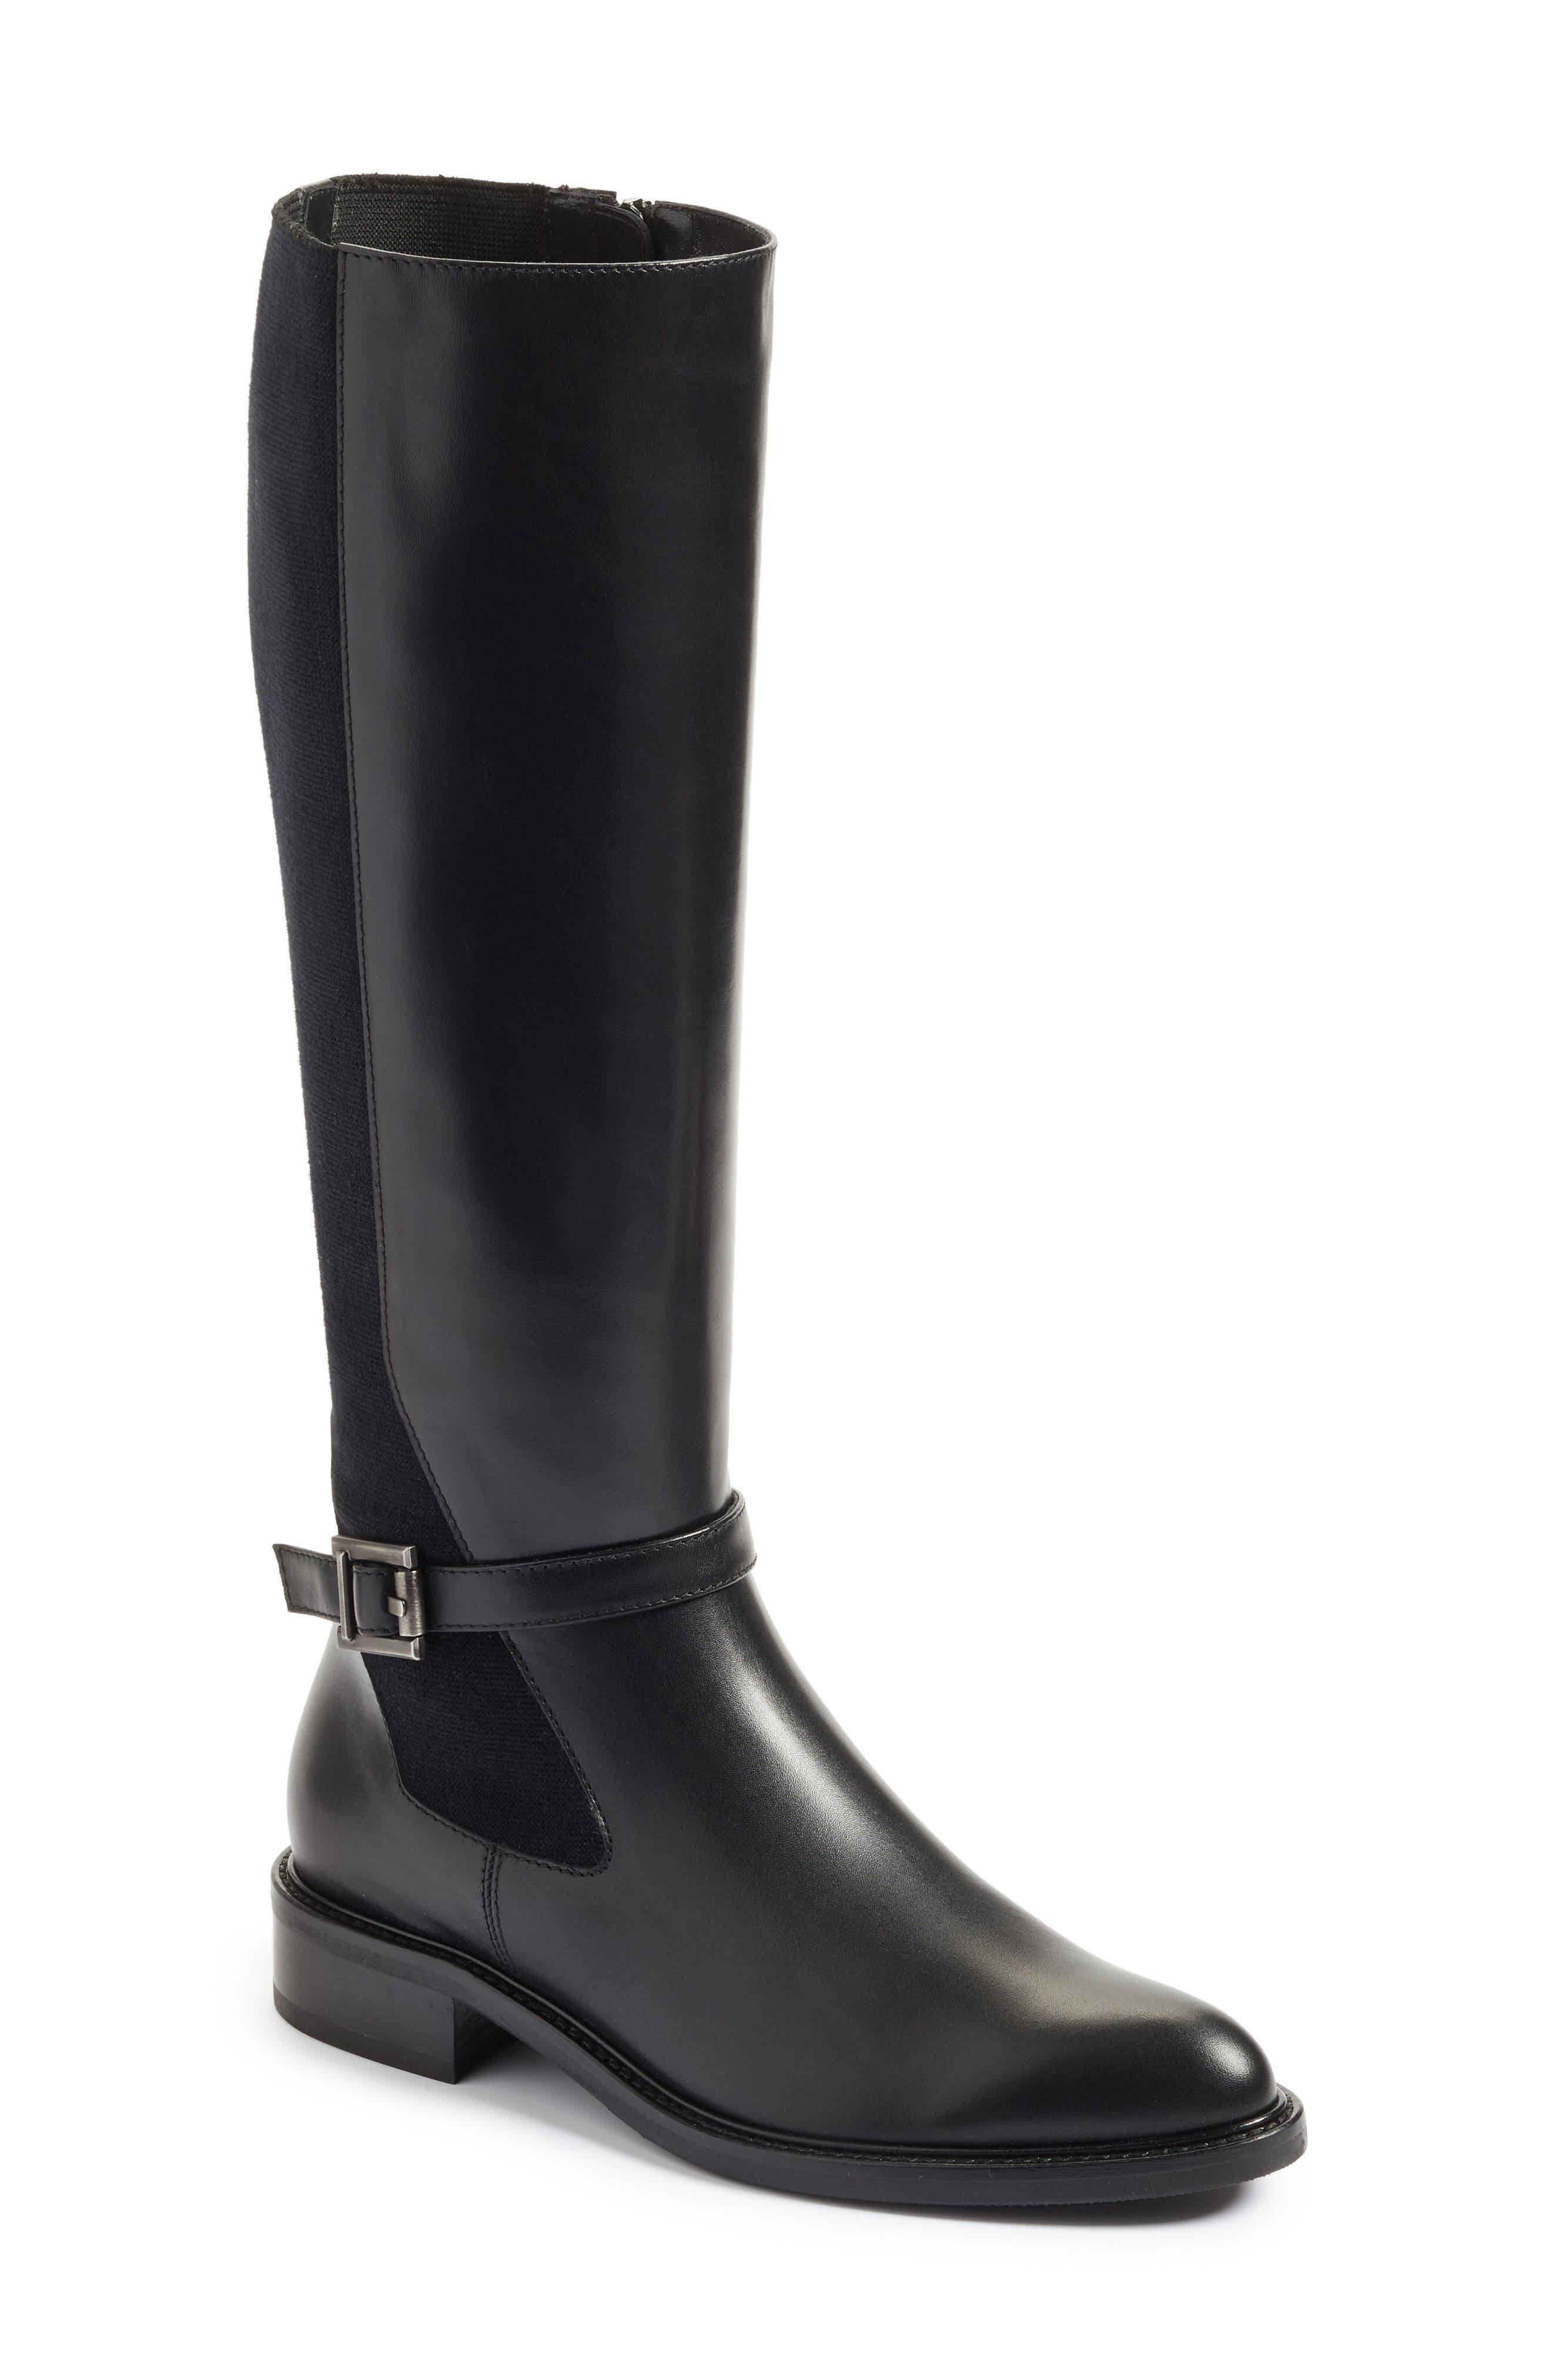 Main Image - Aquatalia Genna Weatherproof Tall Boot (Women)